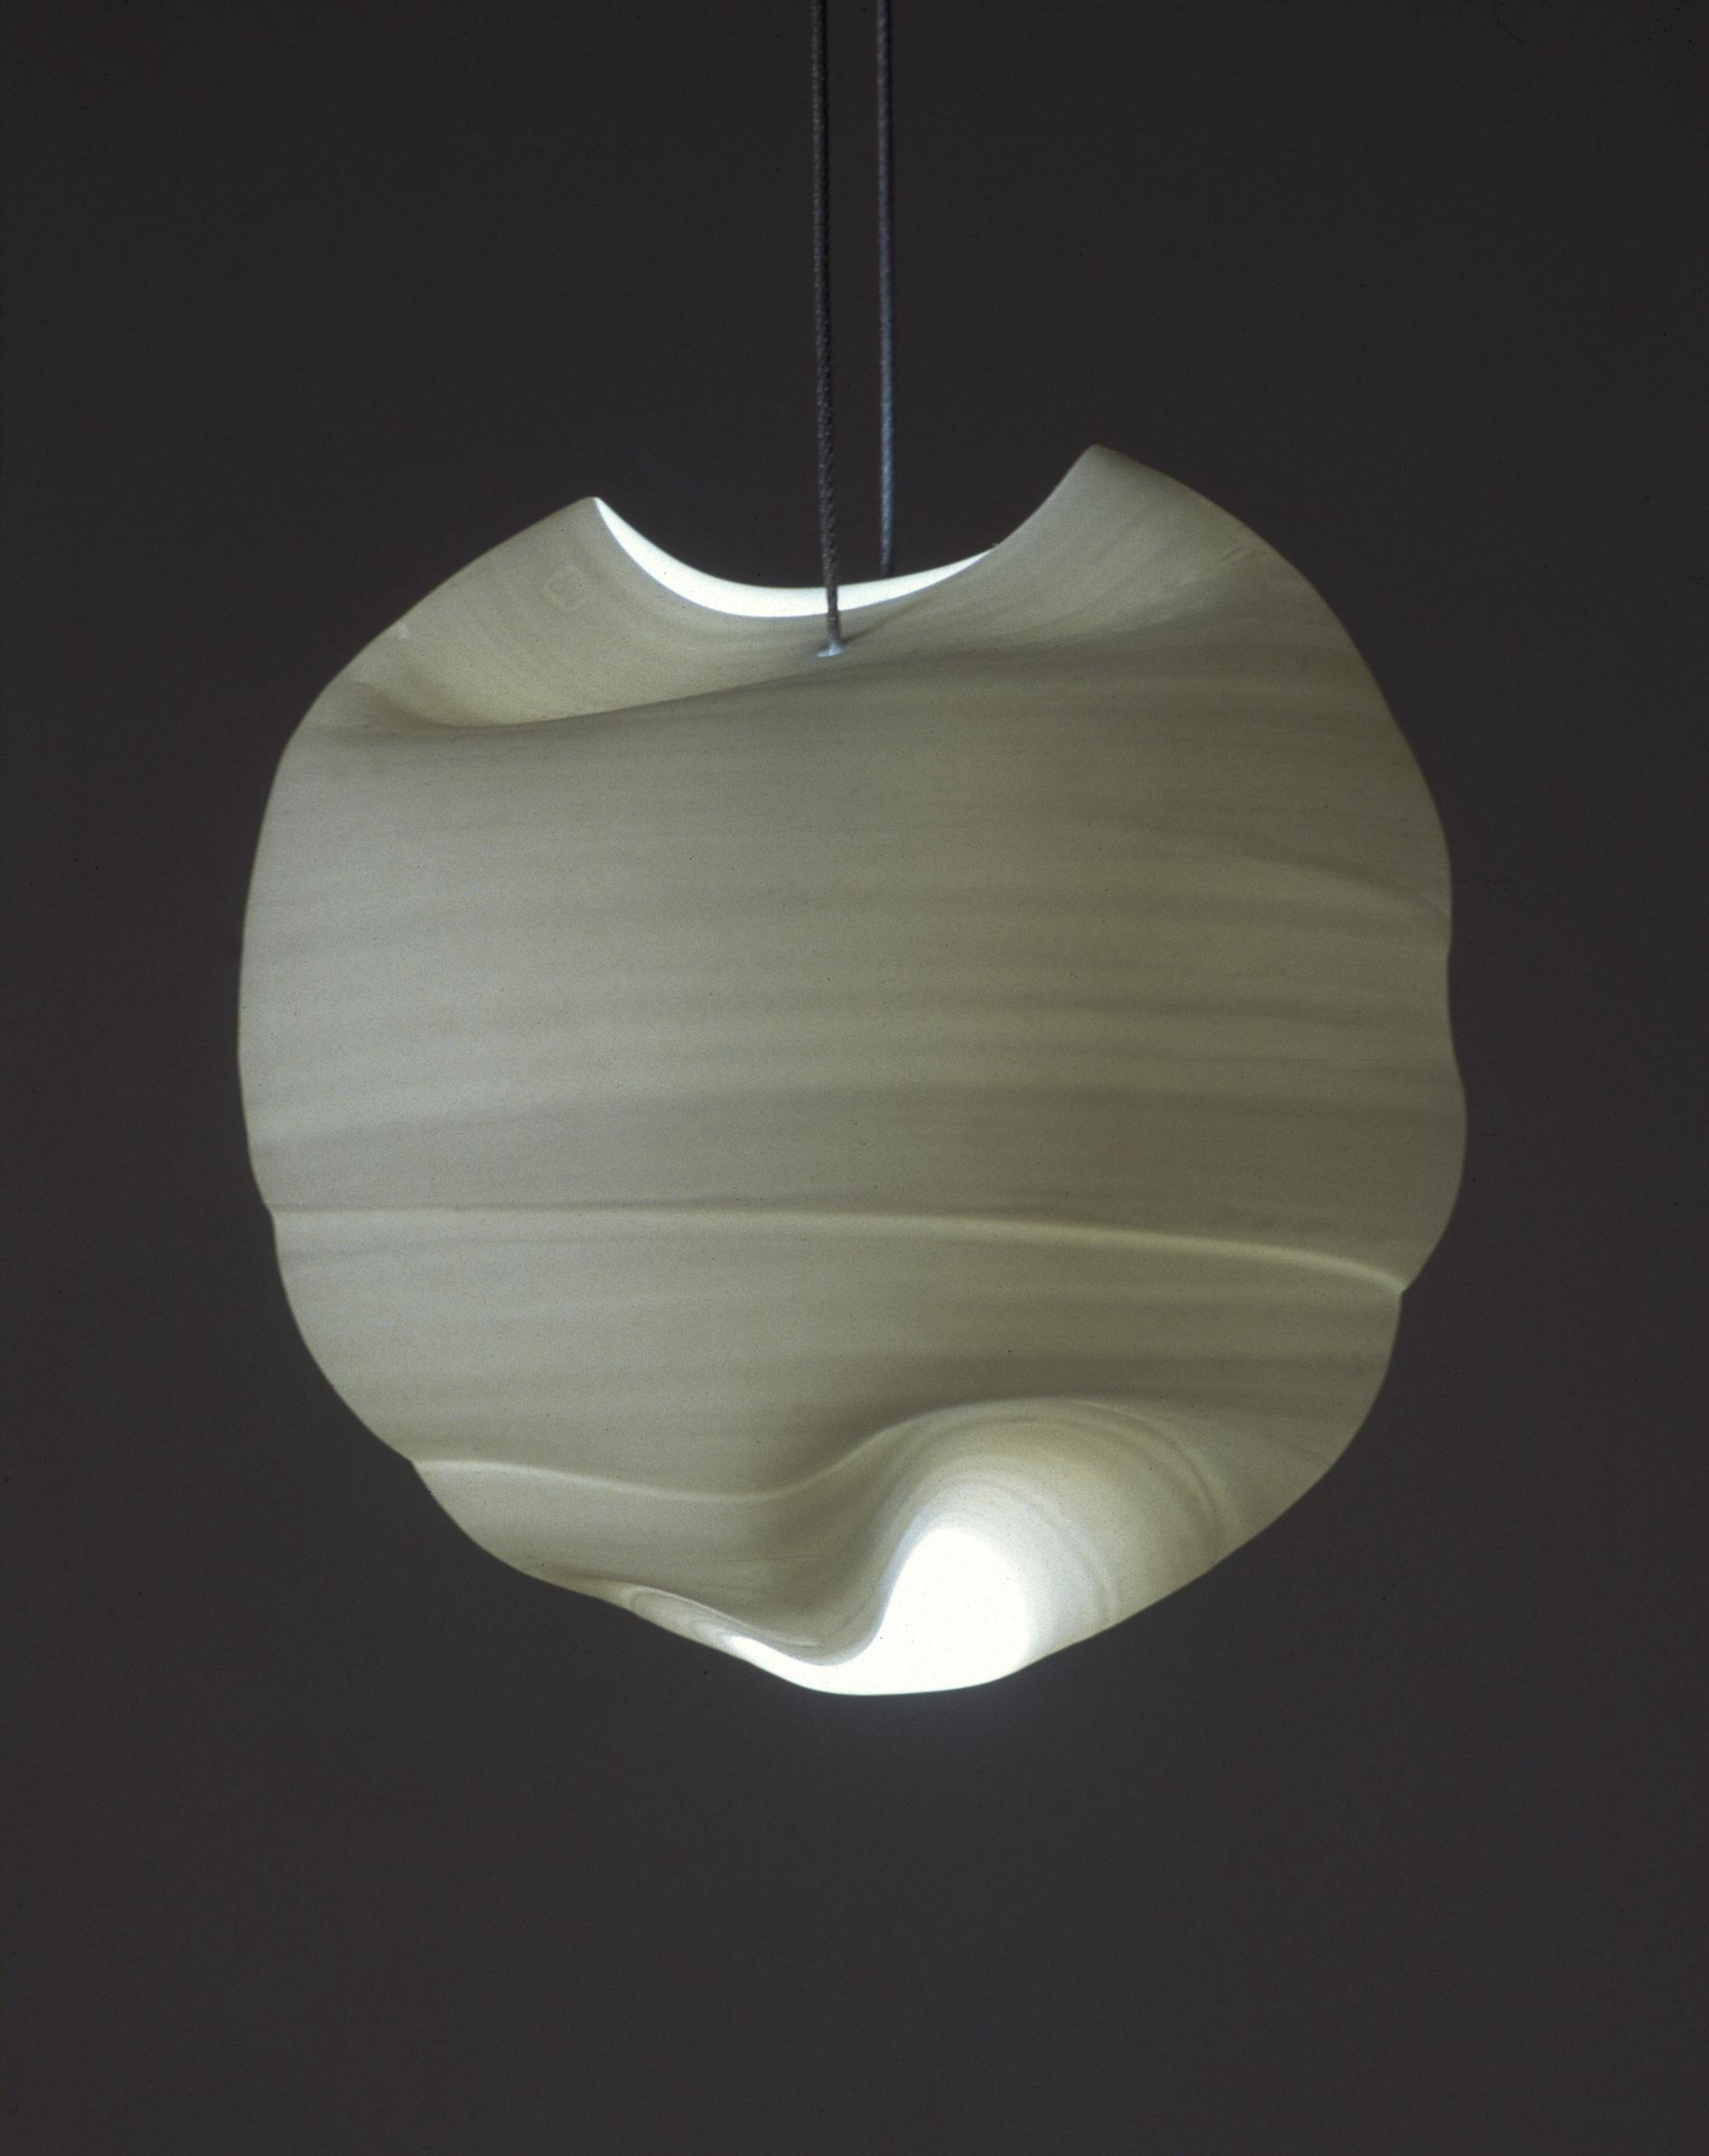 45. Pod Pendant light